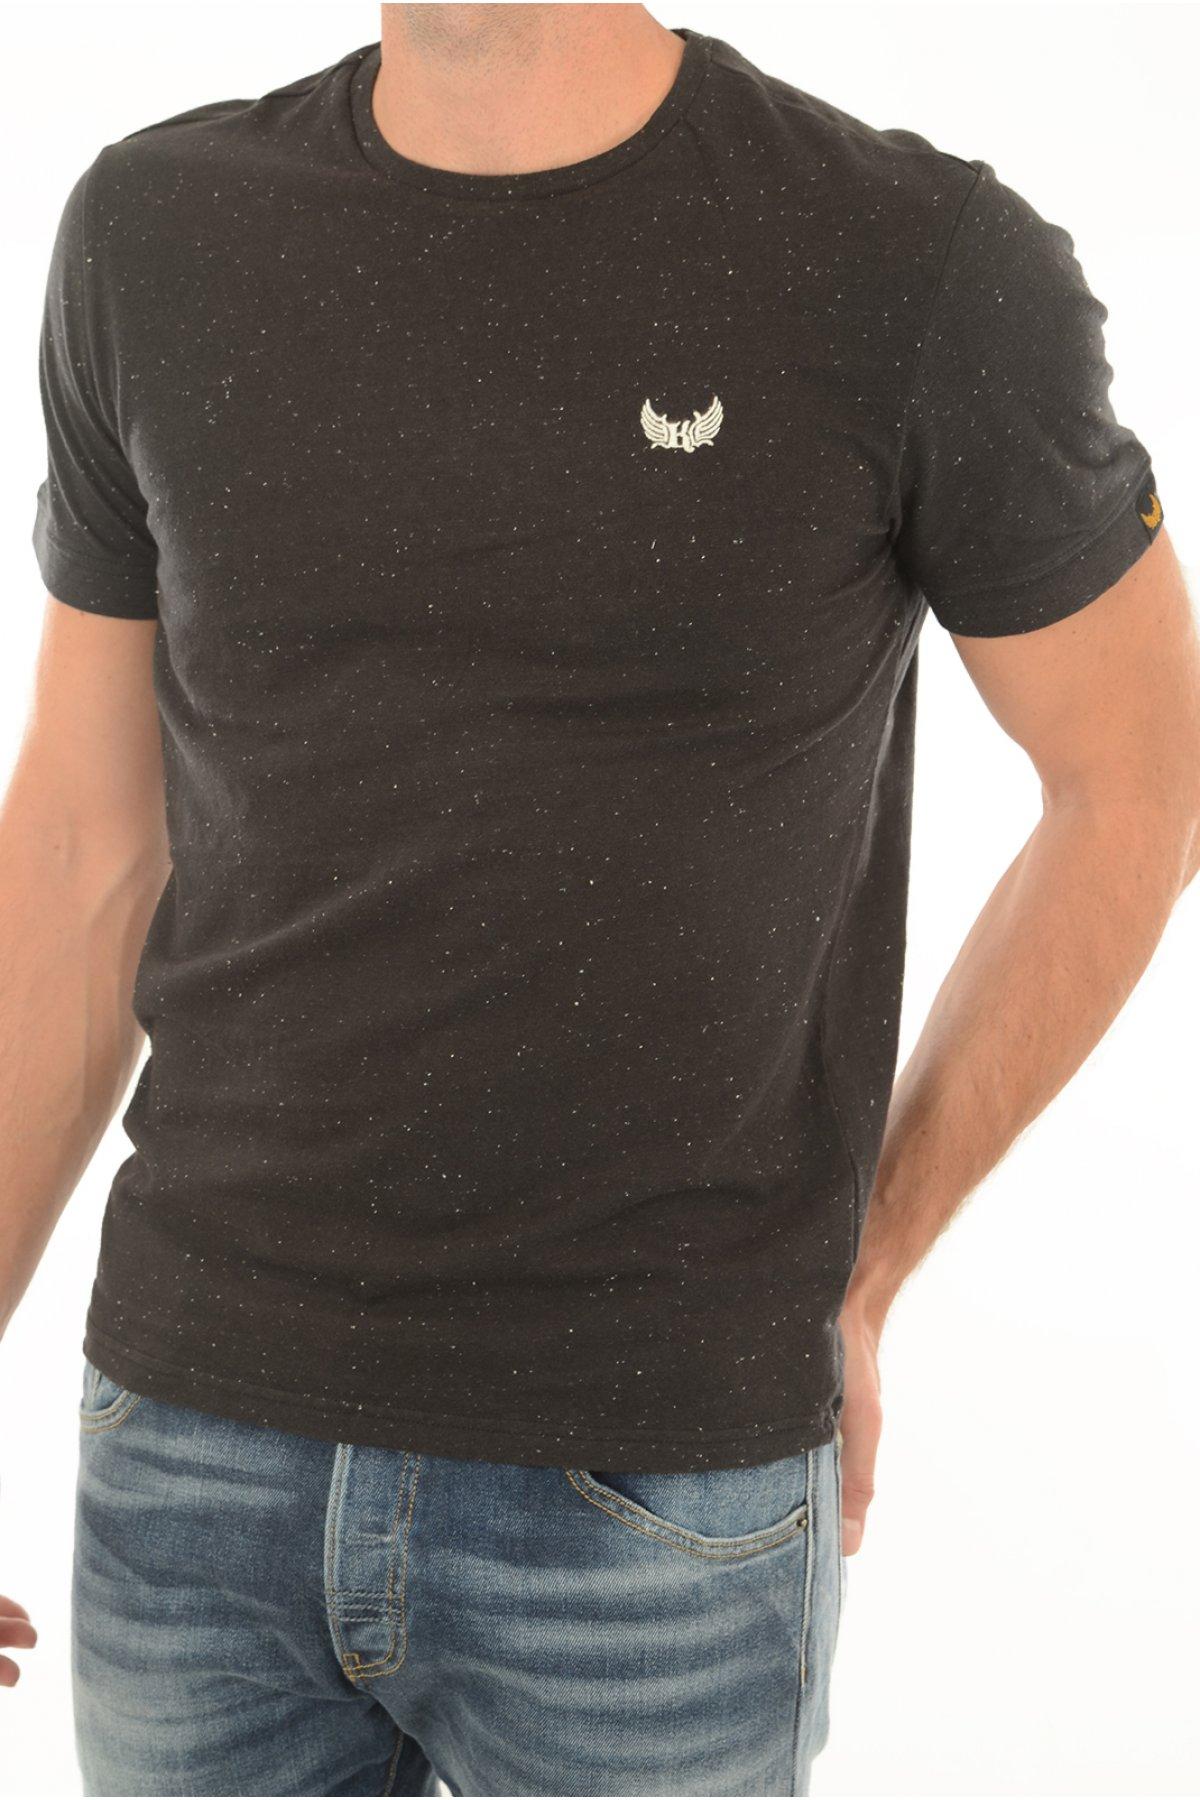 Tee-shirts Kaporal Homme S,m,l,xl,xxl